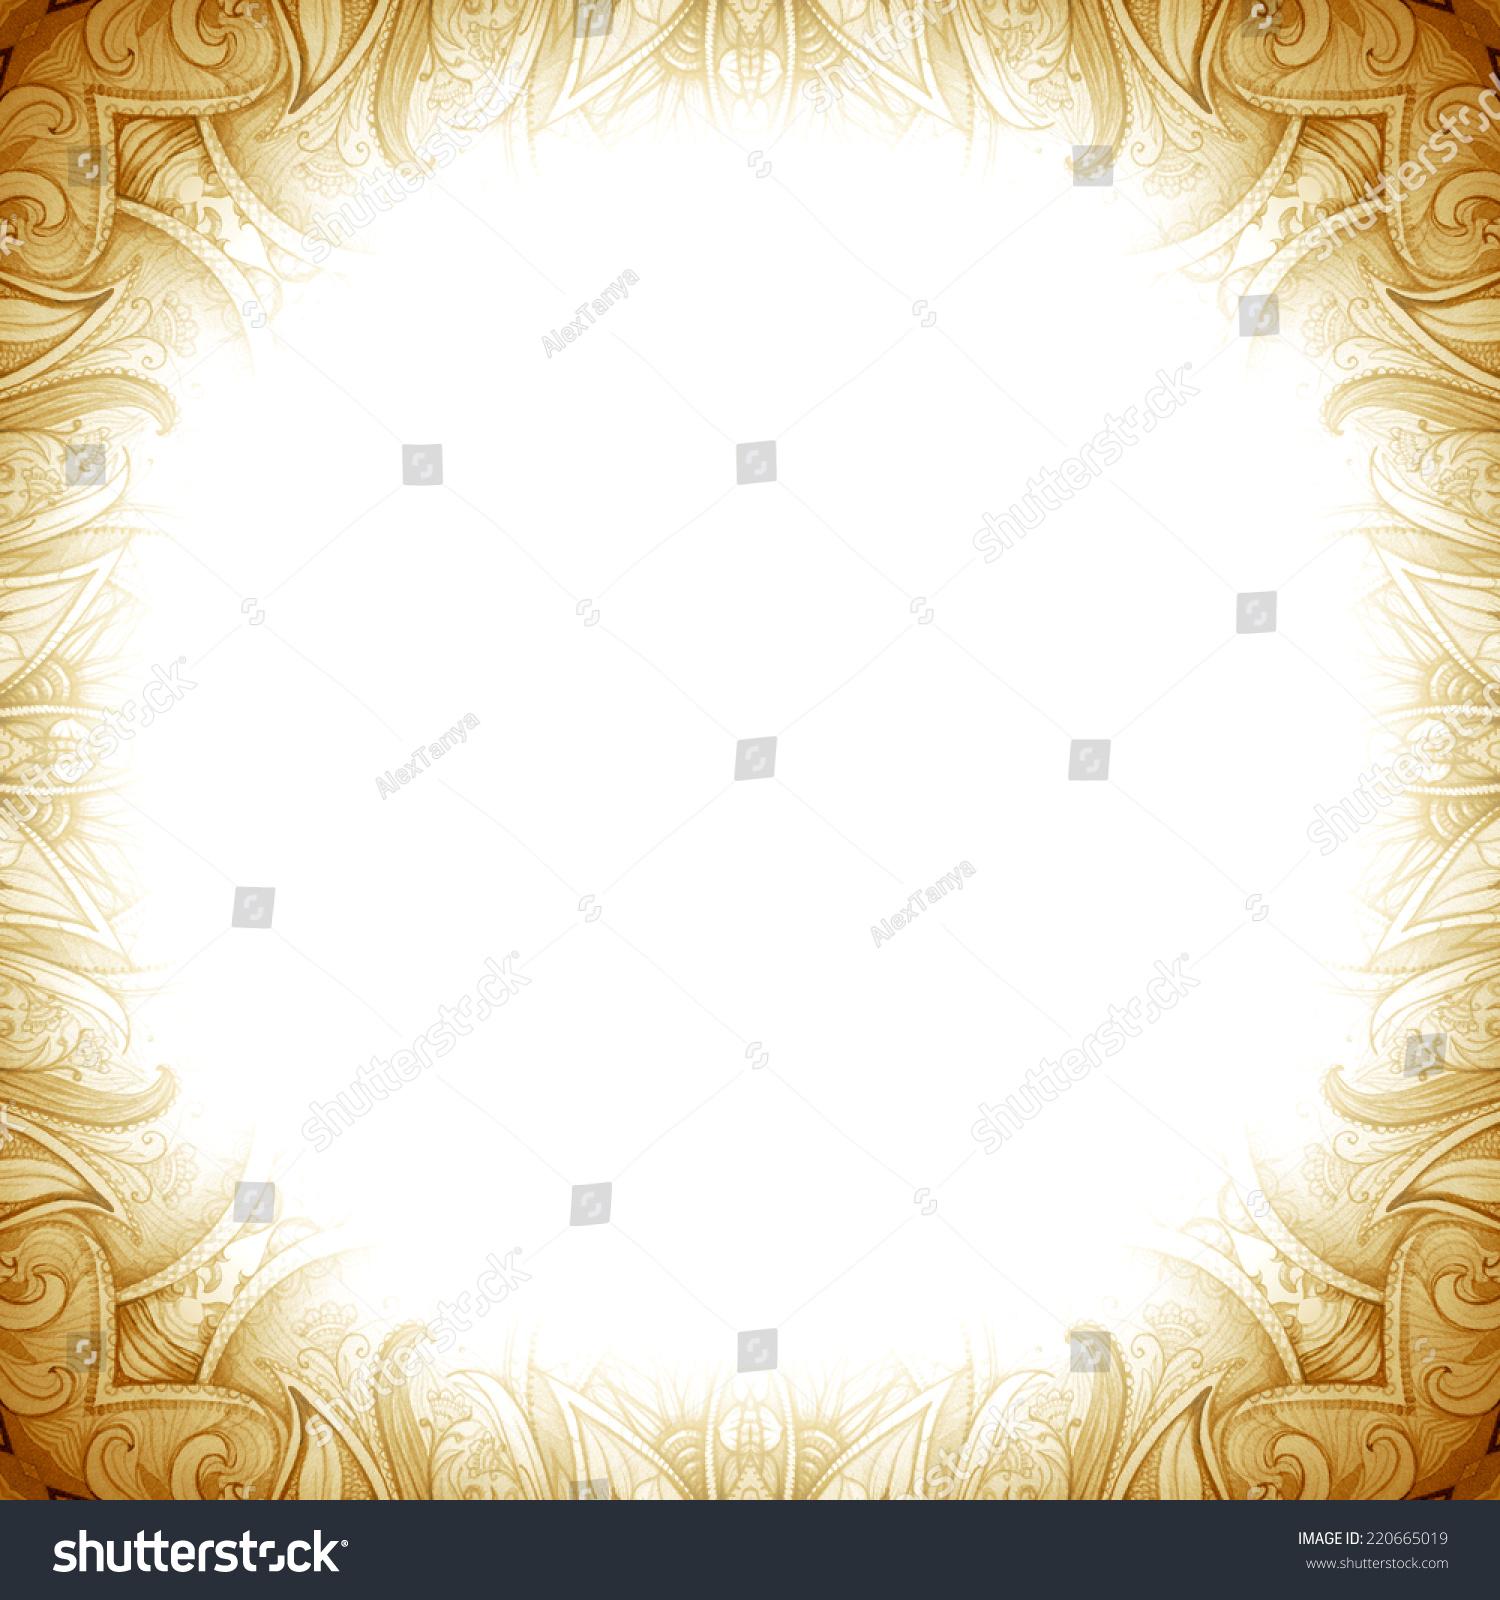 Retro Vintage Wedding Greeting Card Pattern Isolated On White Background Or Invitation